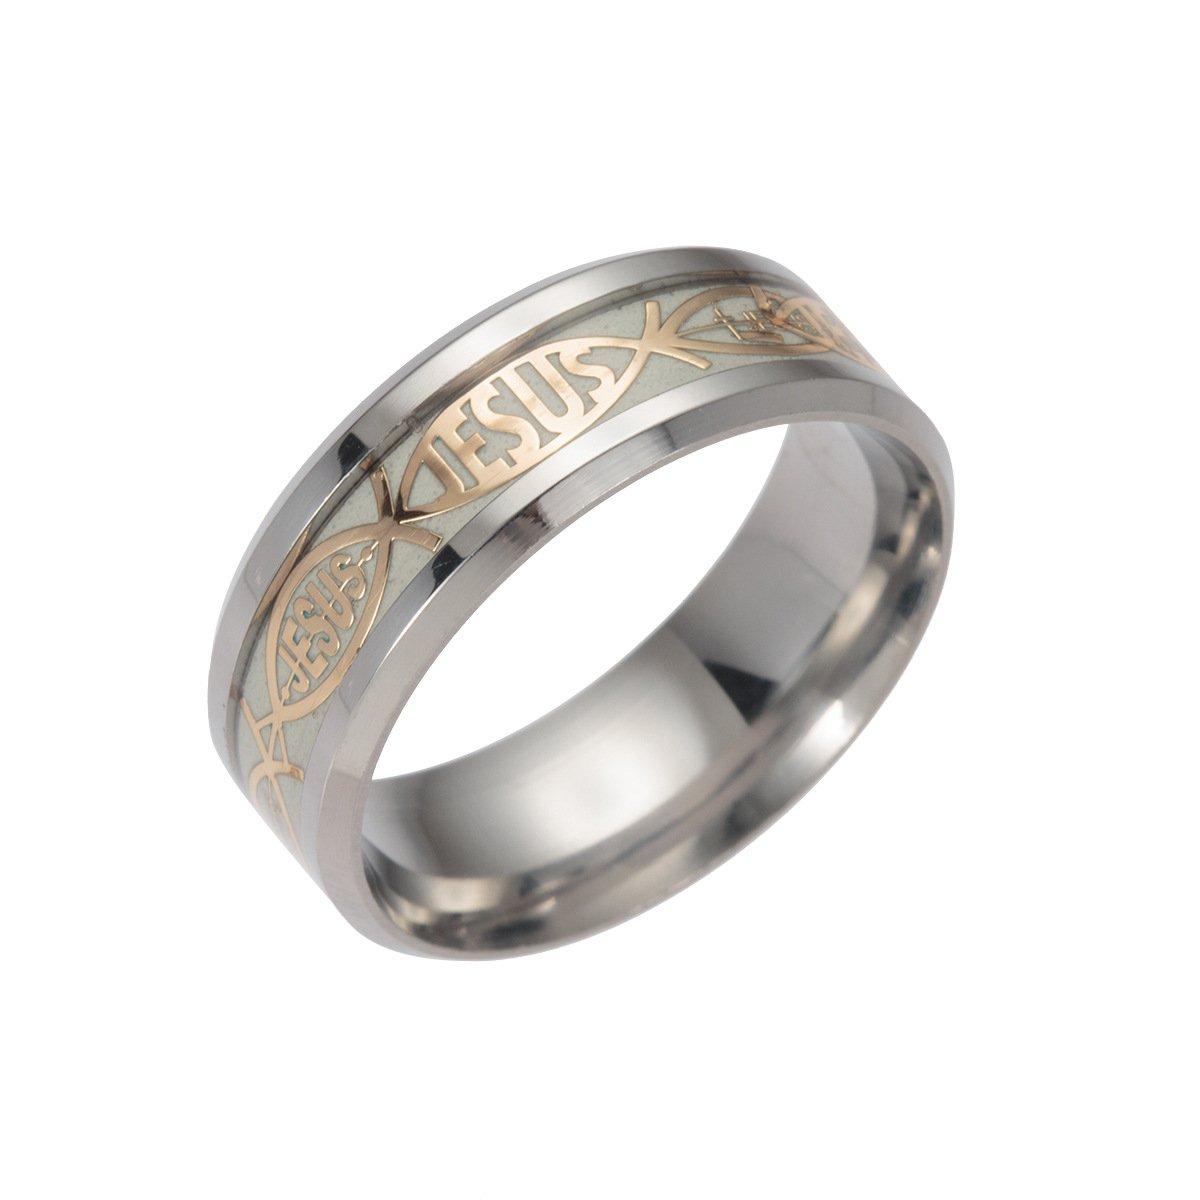 Ginger Lyne Collection Glow in The Dark Jesus Jesusfish Stainless Steel Wedding Band Ring